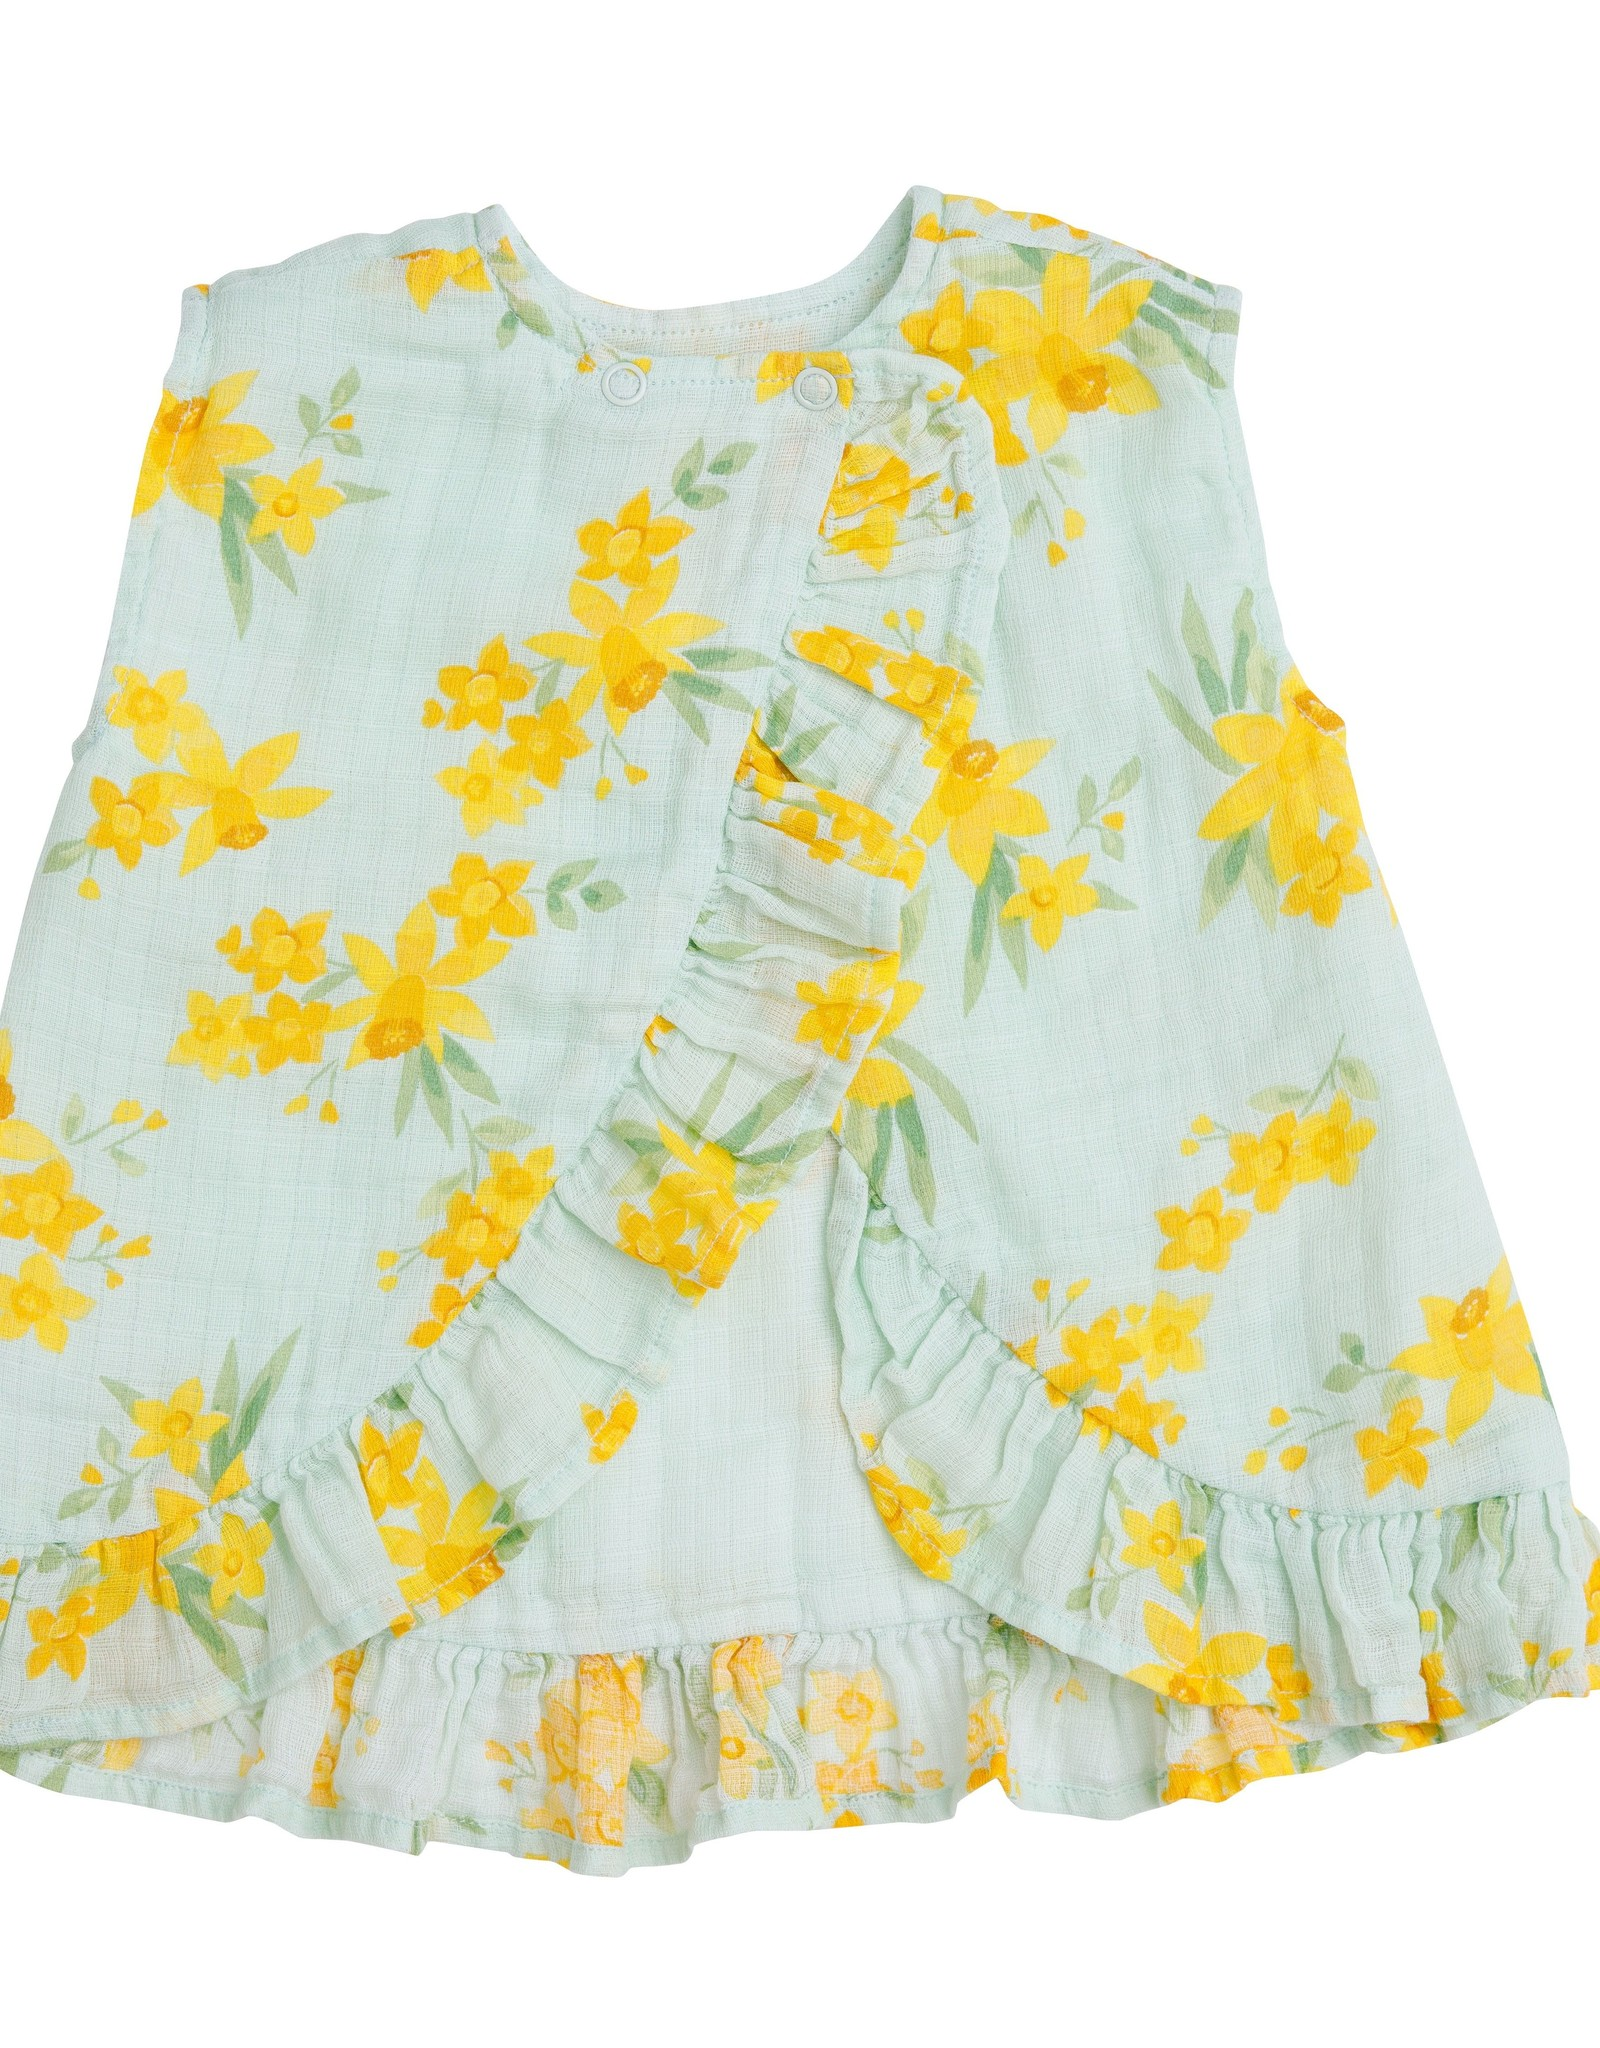 Angel Dear daffodils ruffle top set